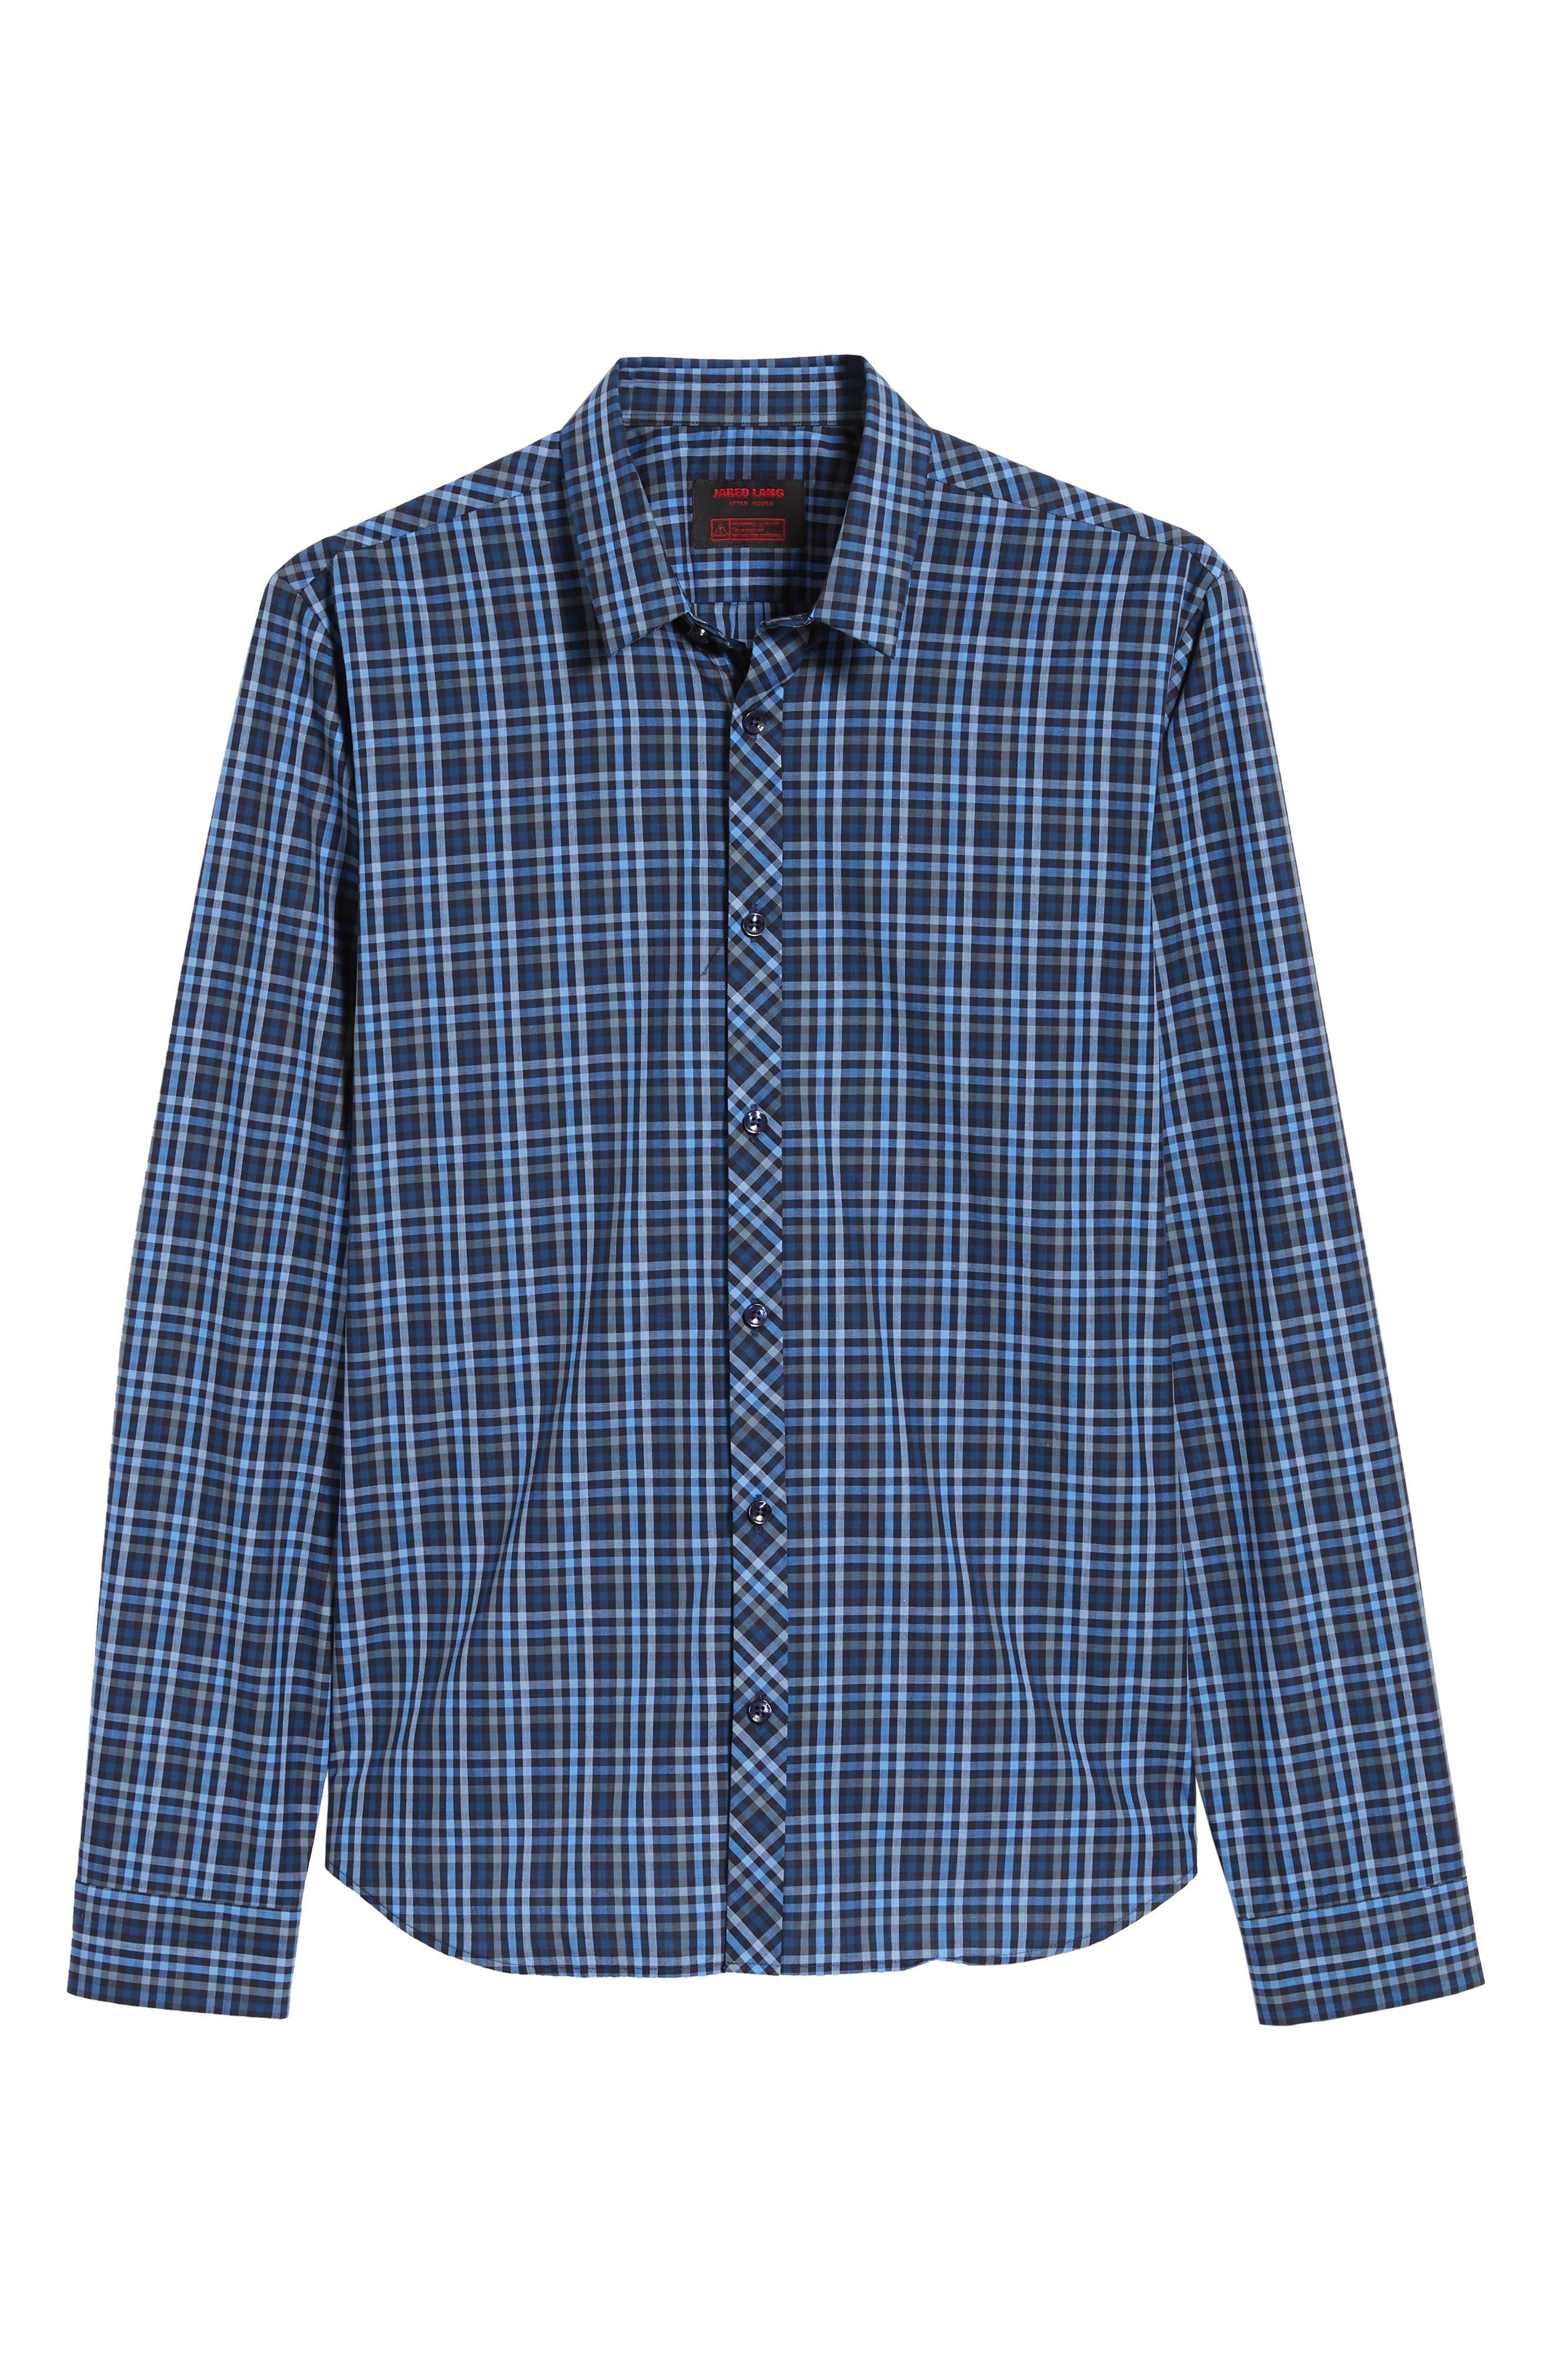 Trim Fit Sport Shirt,                             Alternate thumbnail 5, color,                             NAVY - BLUE MULTI CHECK